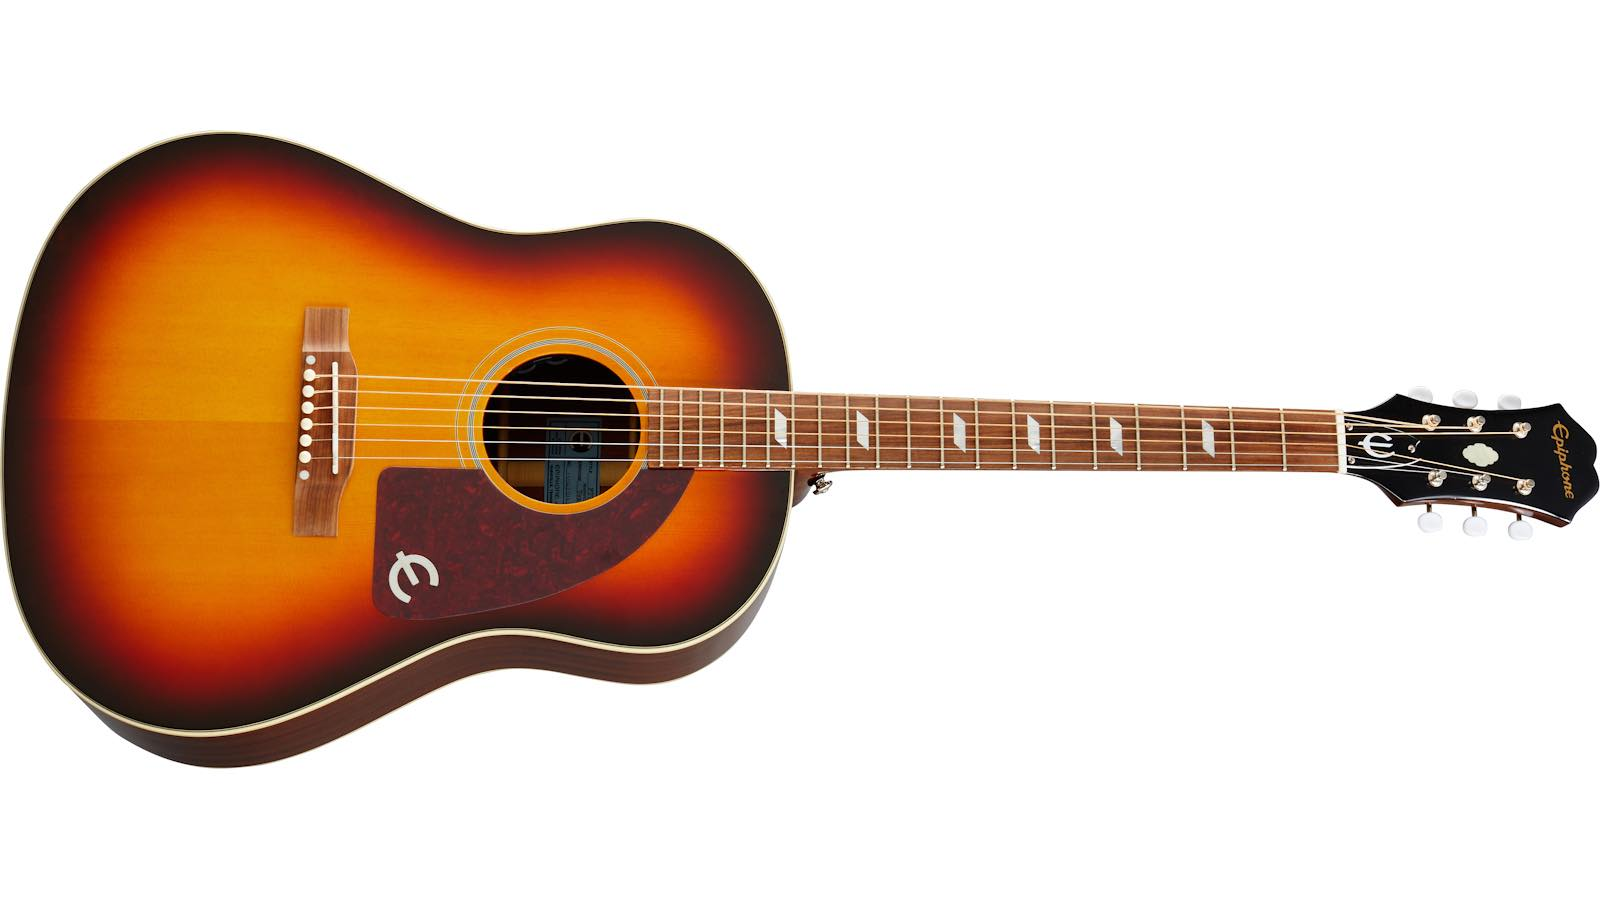 Epiphone Masterbilt Texan chitarra acustica guitar acoustic strumenti musicali